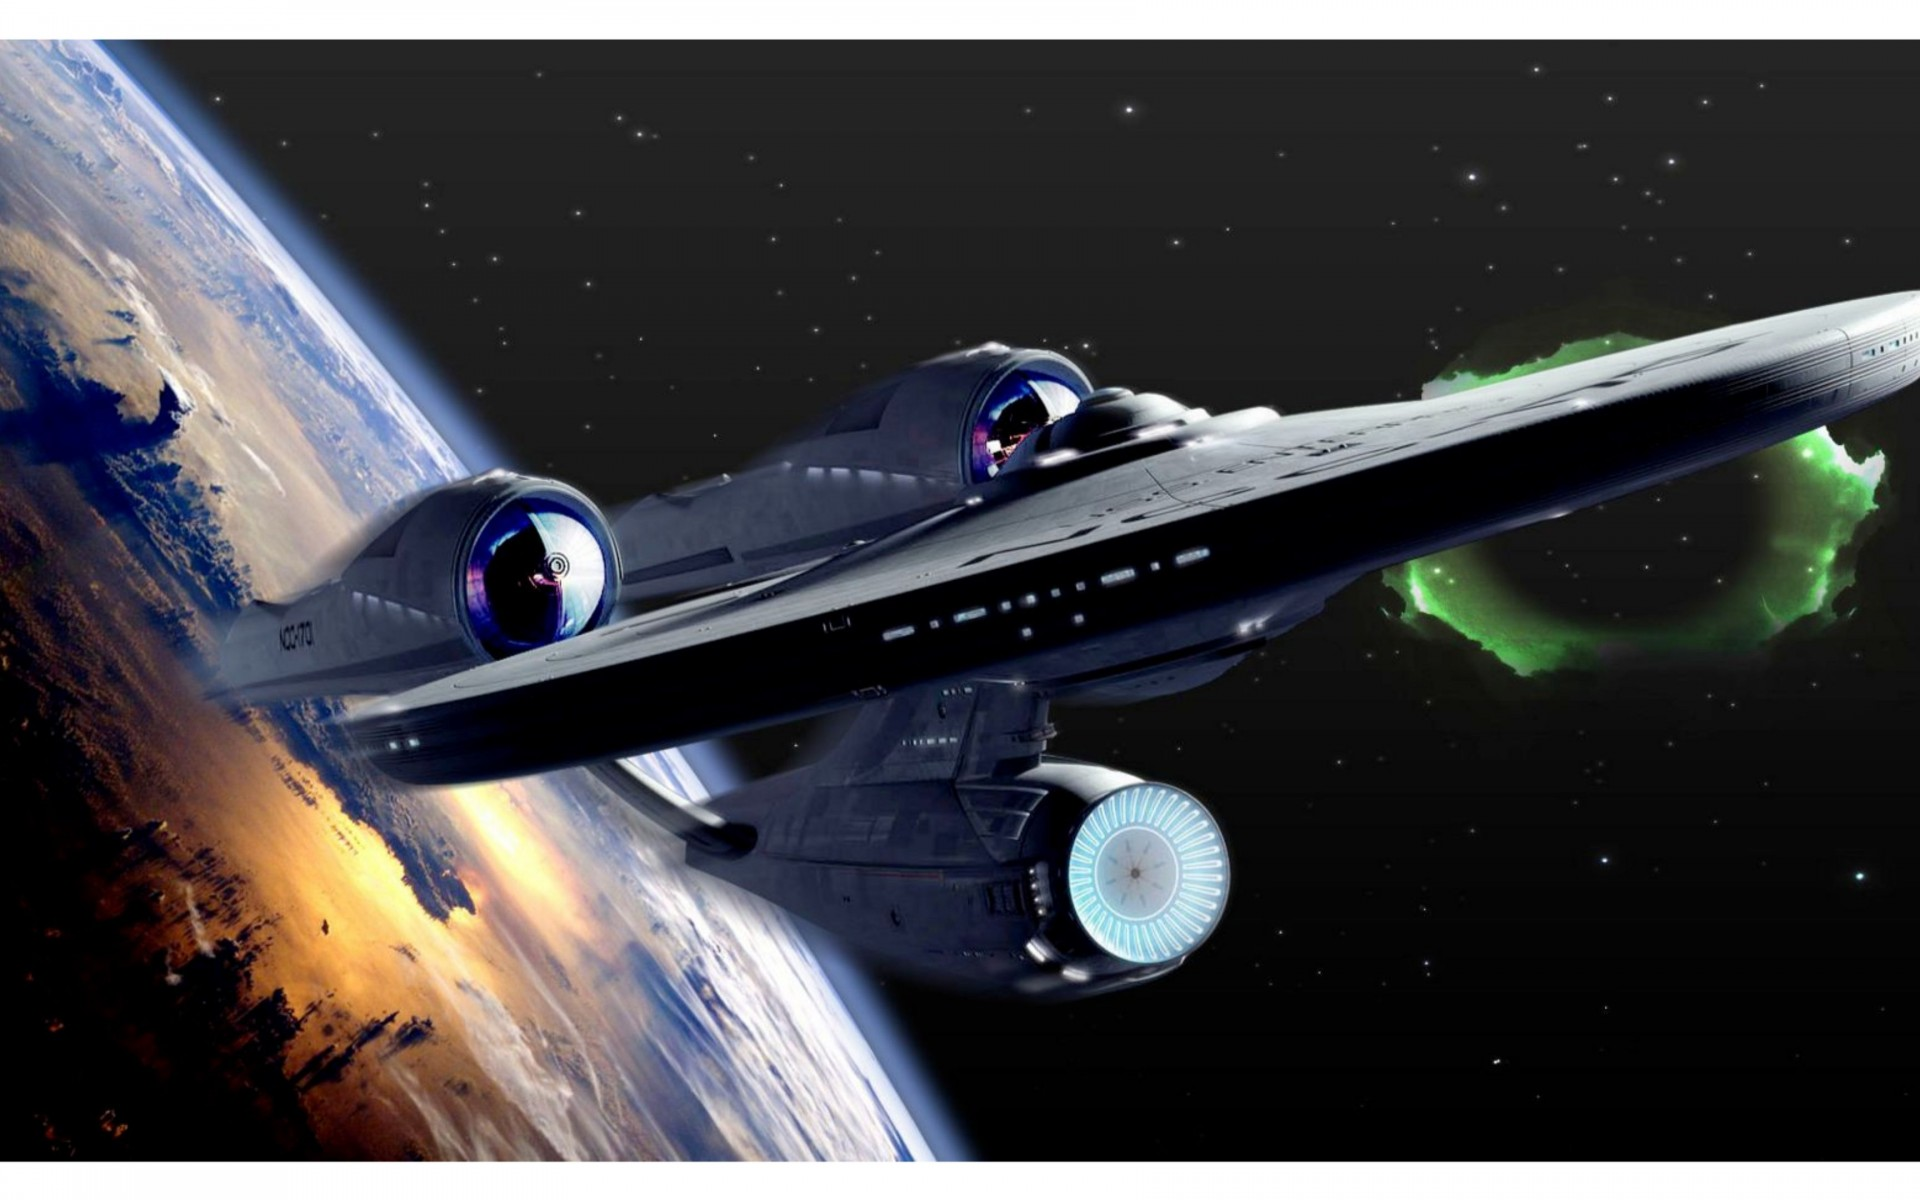 Inspiring Star Trek Beyond 4K Wallpaper 4K Wallpaper 1920x1200